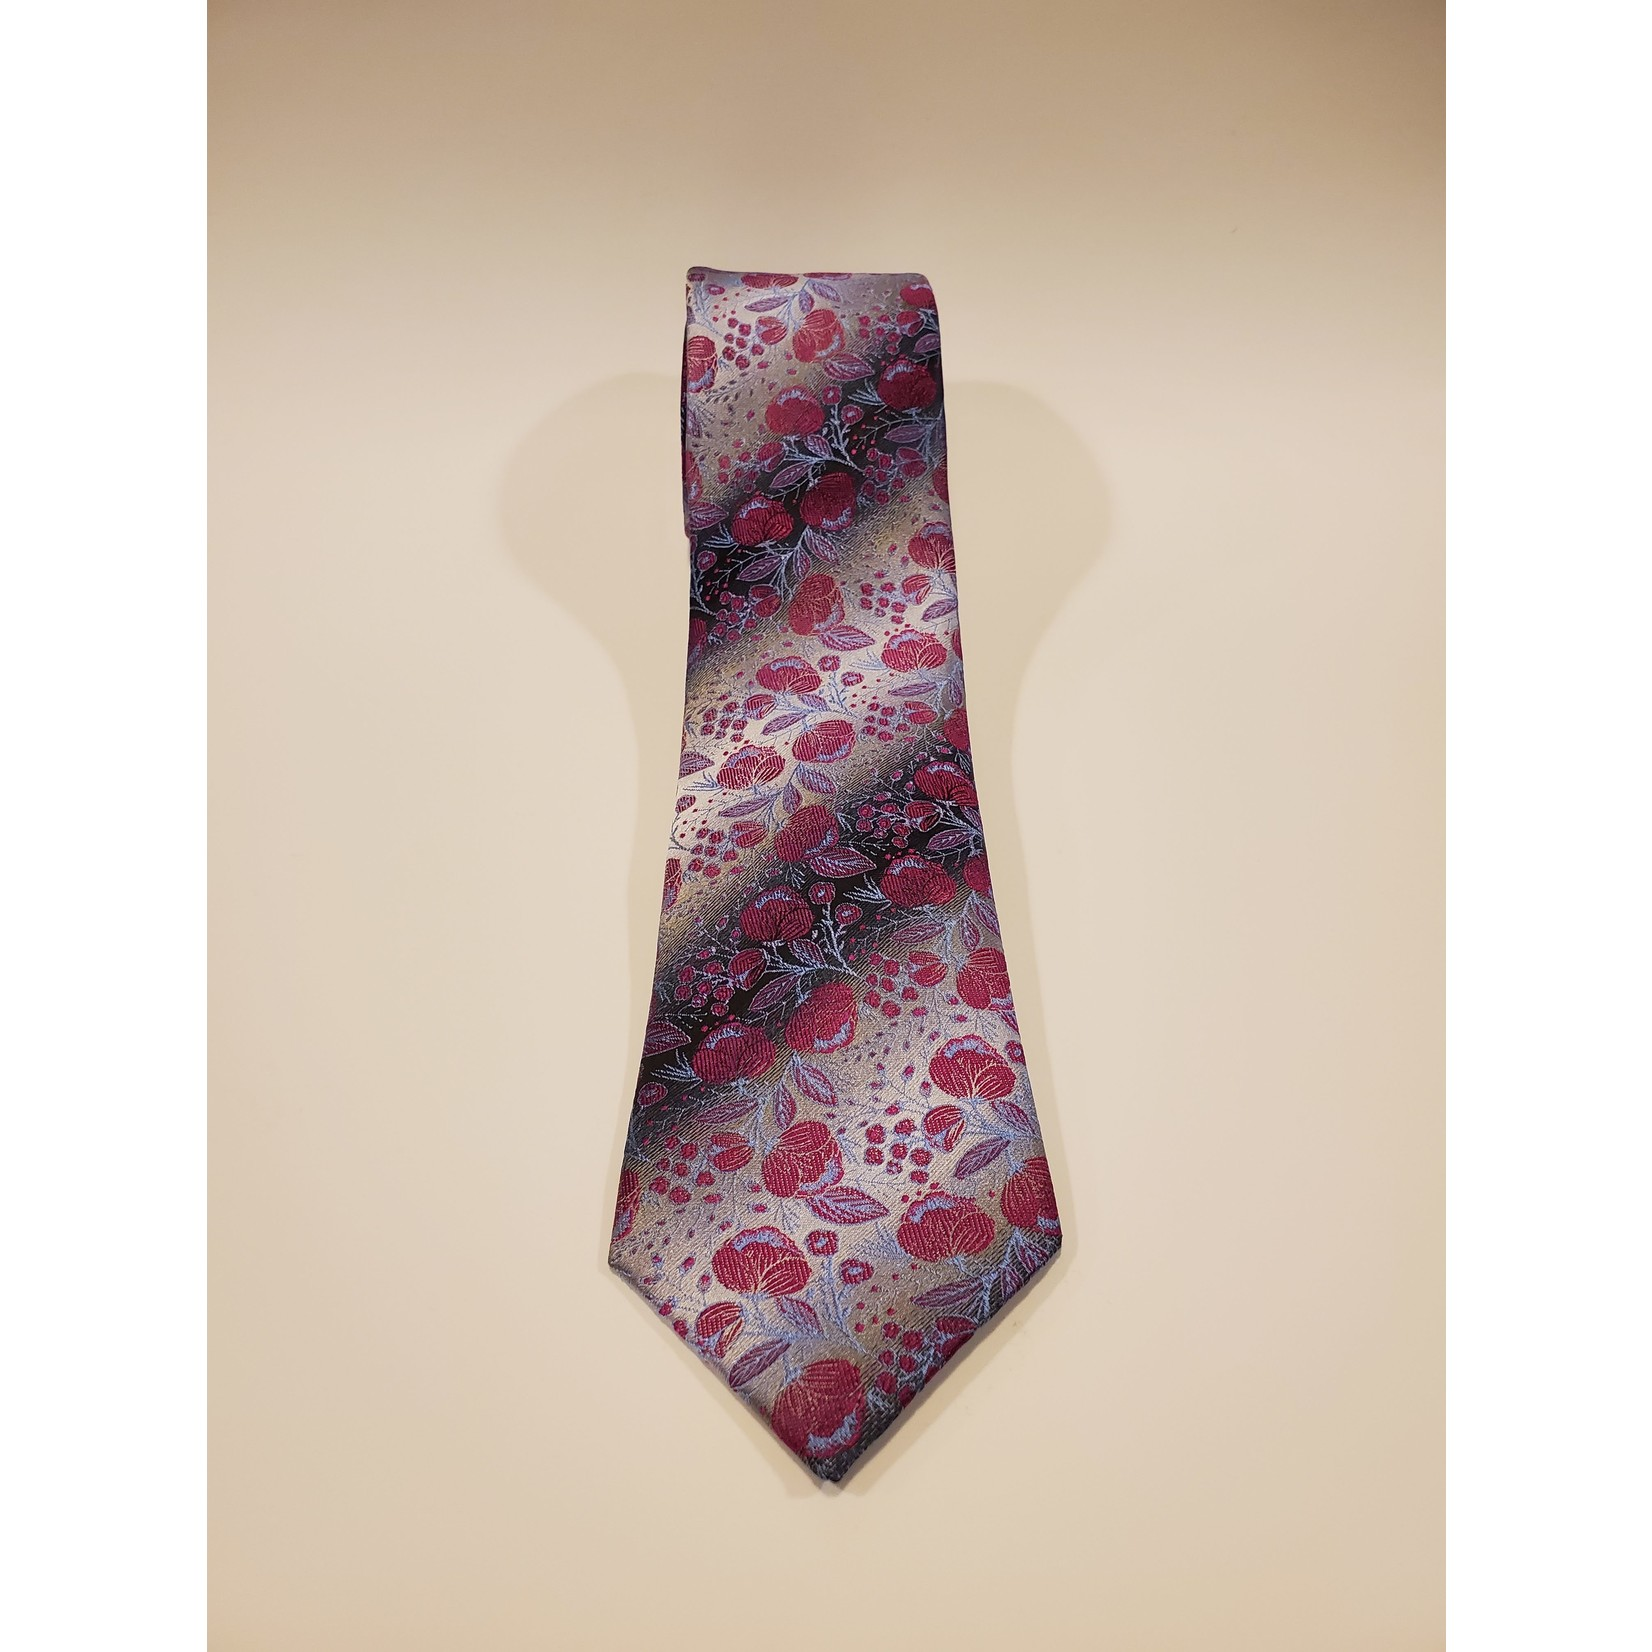 Polifroni Blu 201250 Jacquard Floral Silk Tie